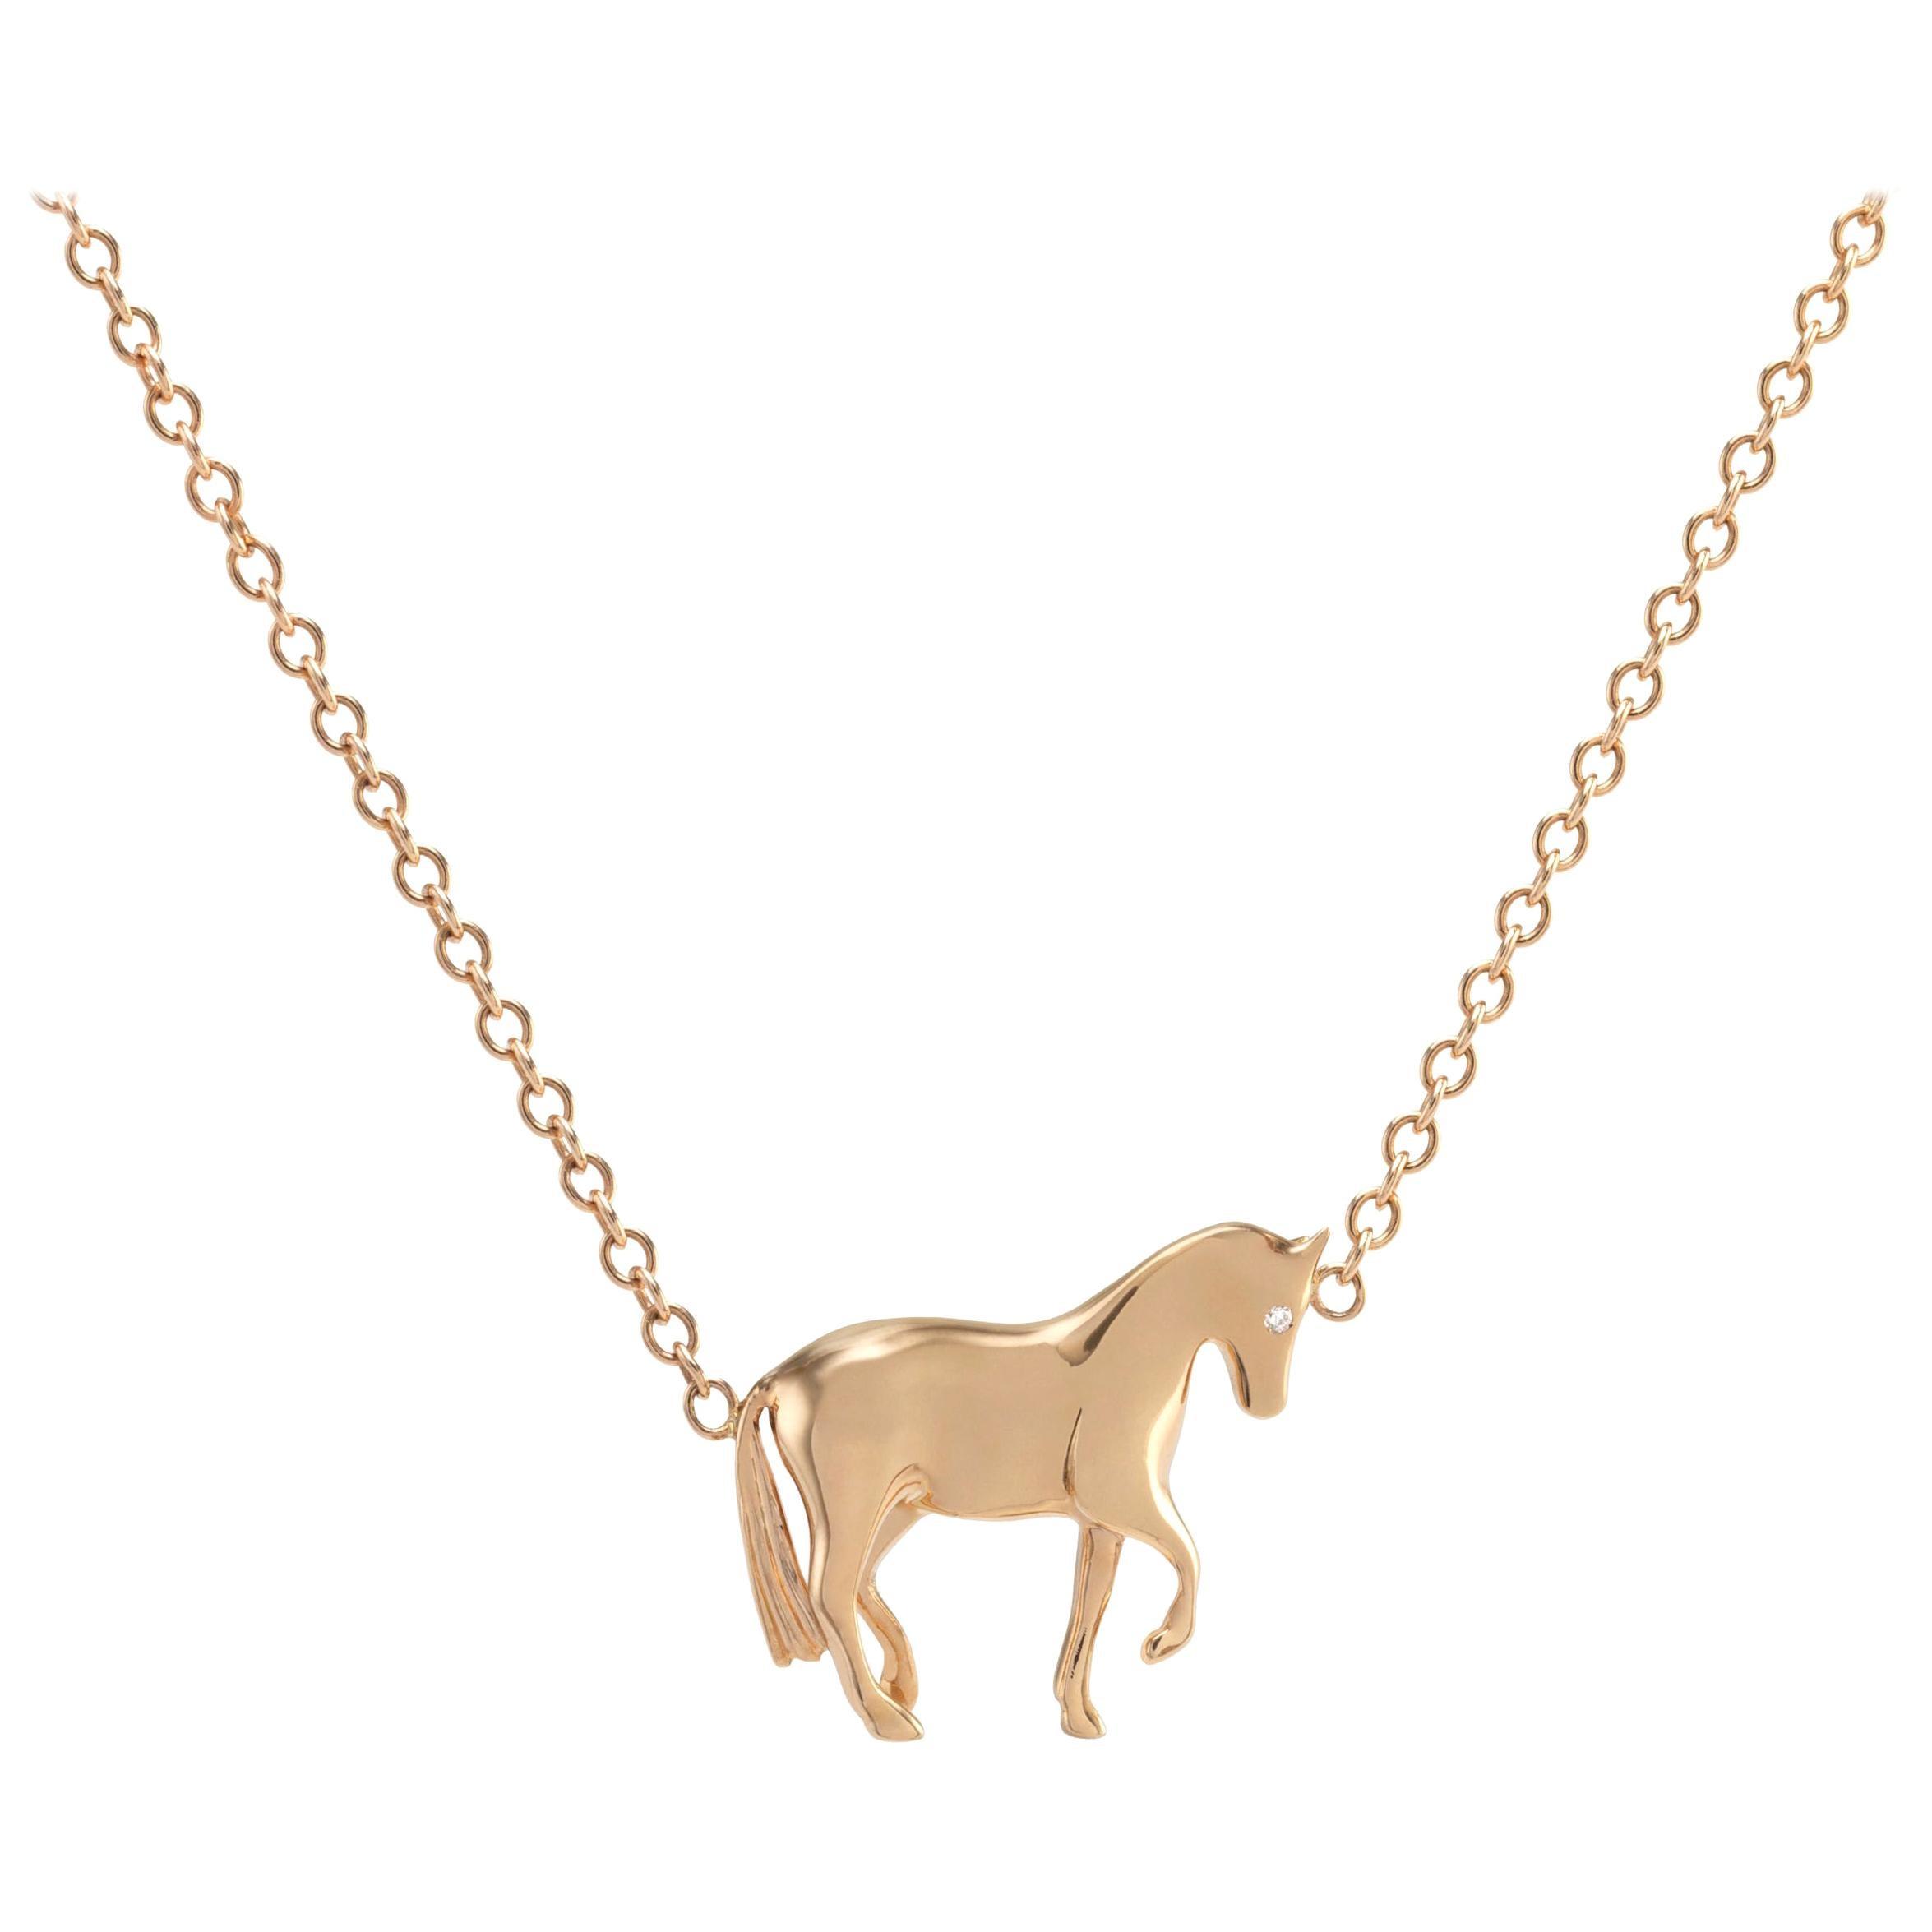 Ubaldi Gioielli 18 Karat Gold Equestrian Horse Necklace Pendant Diamond